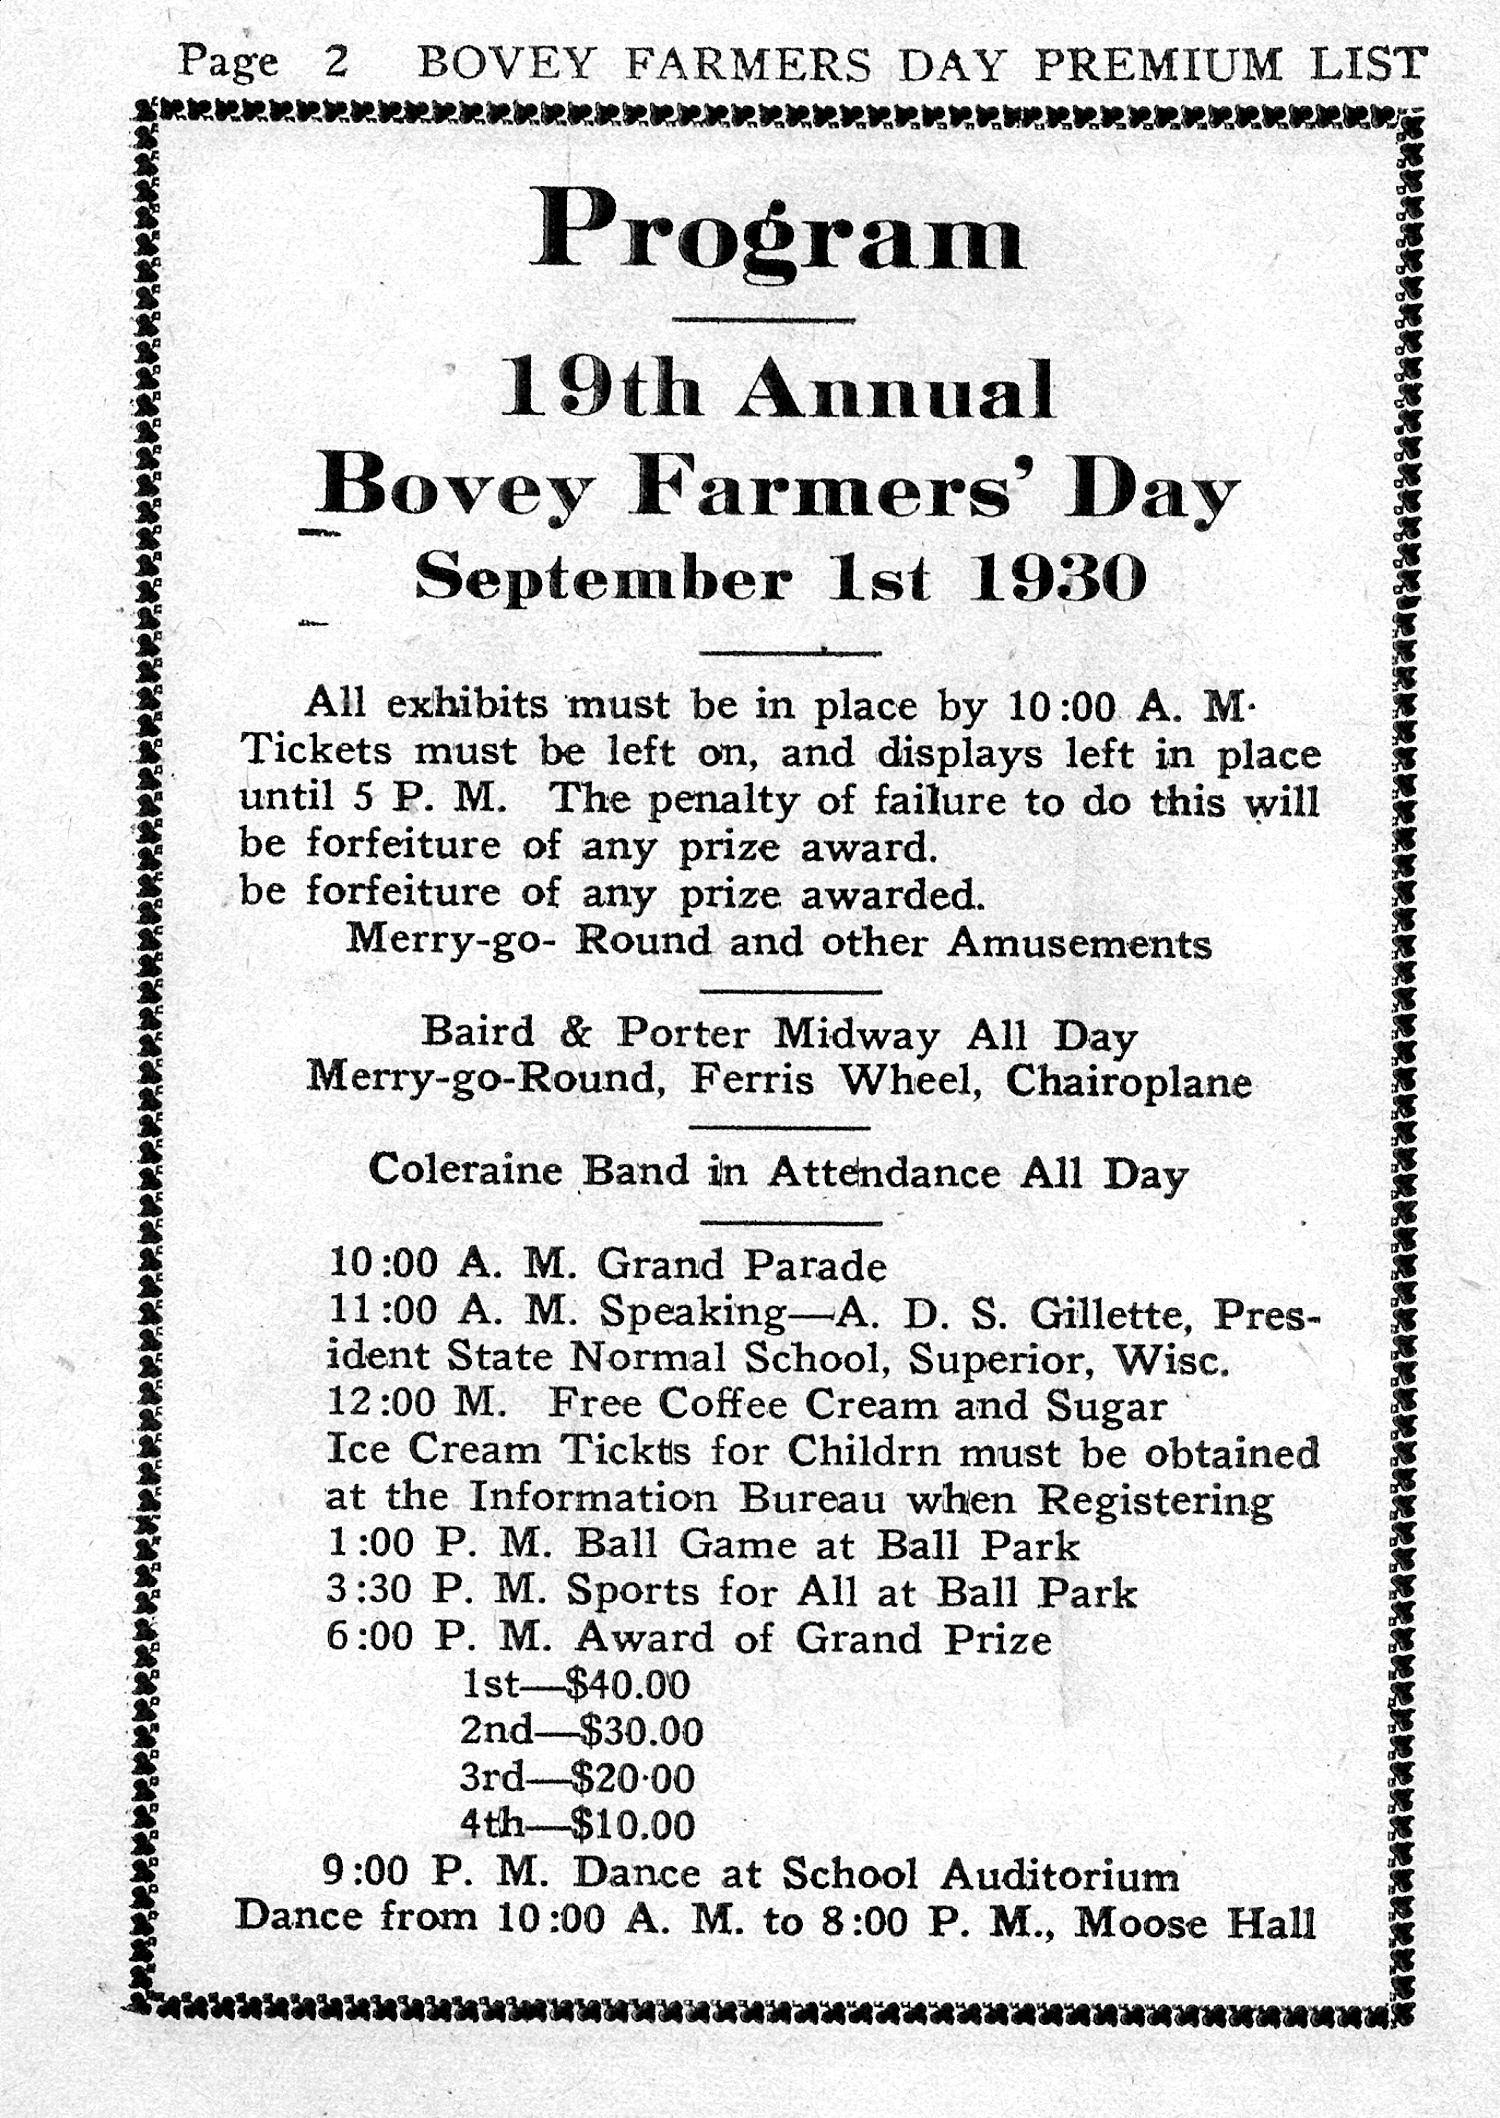 1930 Program